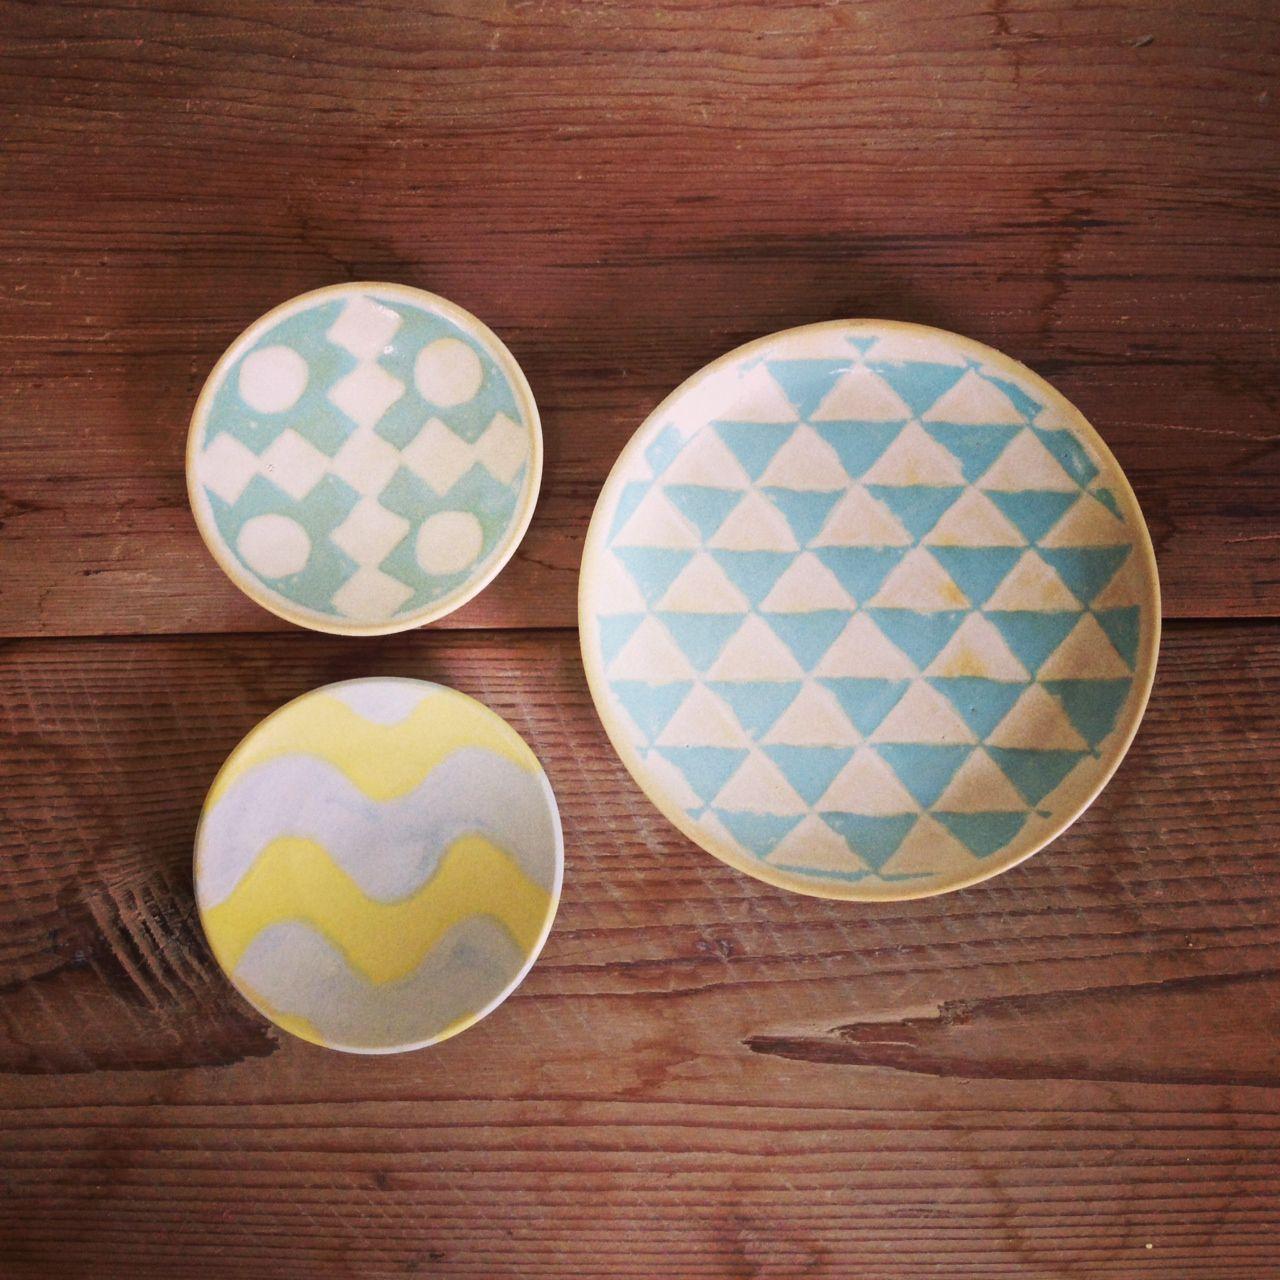 木村香菜子 / KK ceramic works